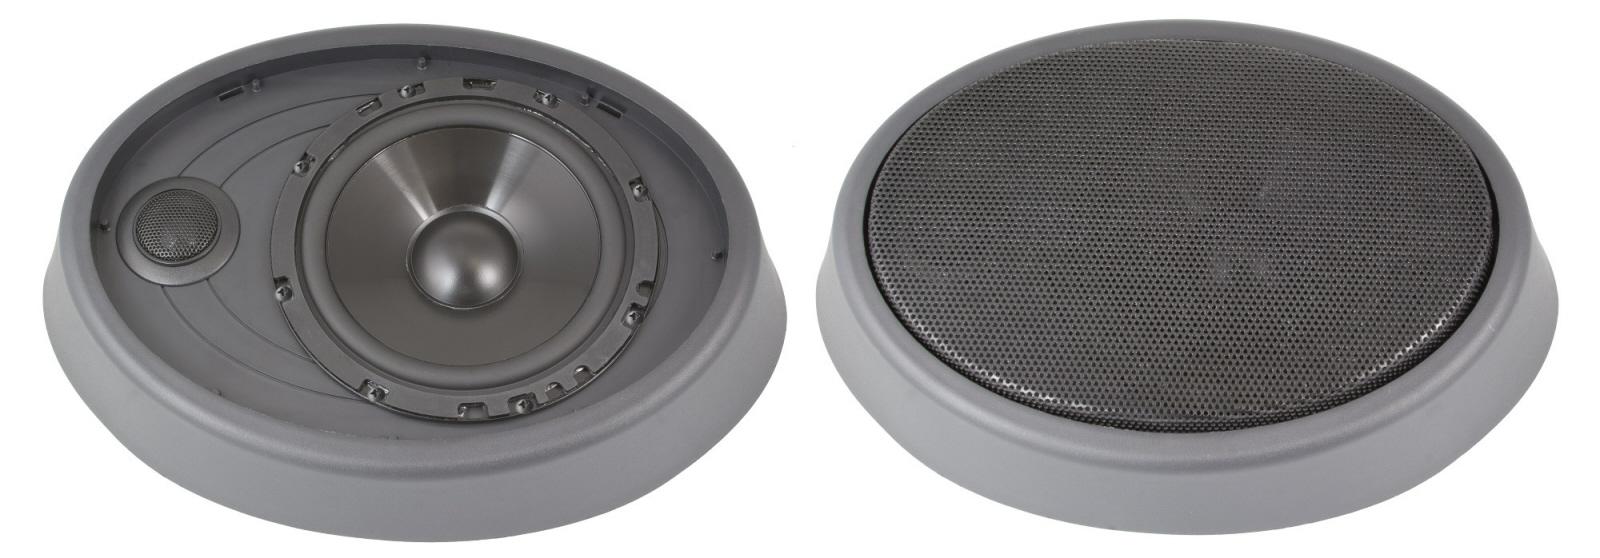 RetroSound 6 x 9 Pods with 65 Component System